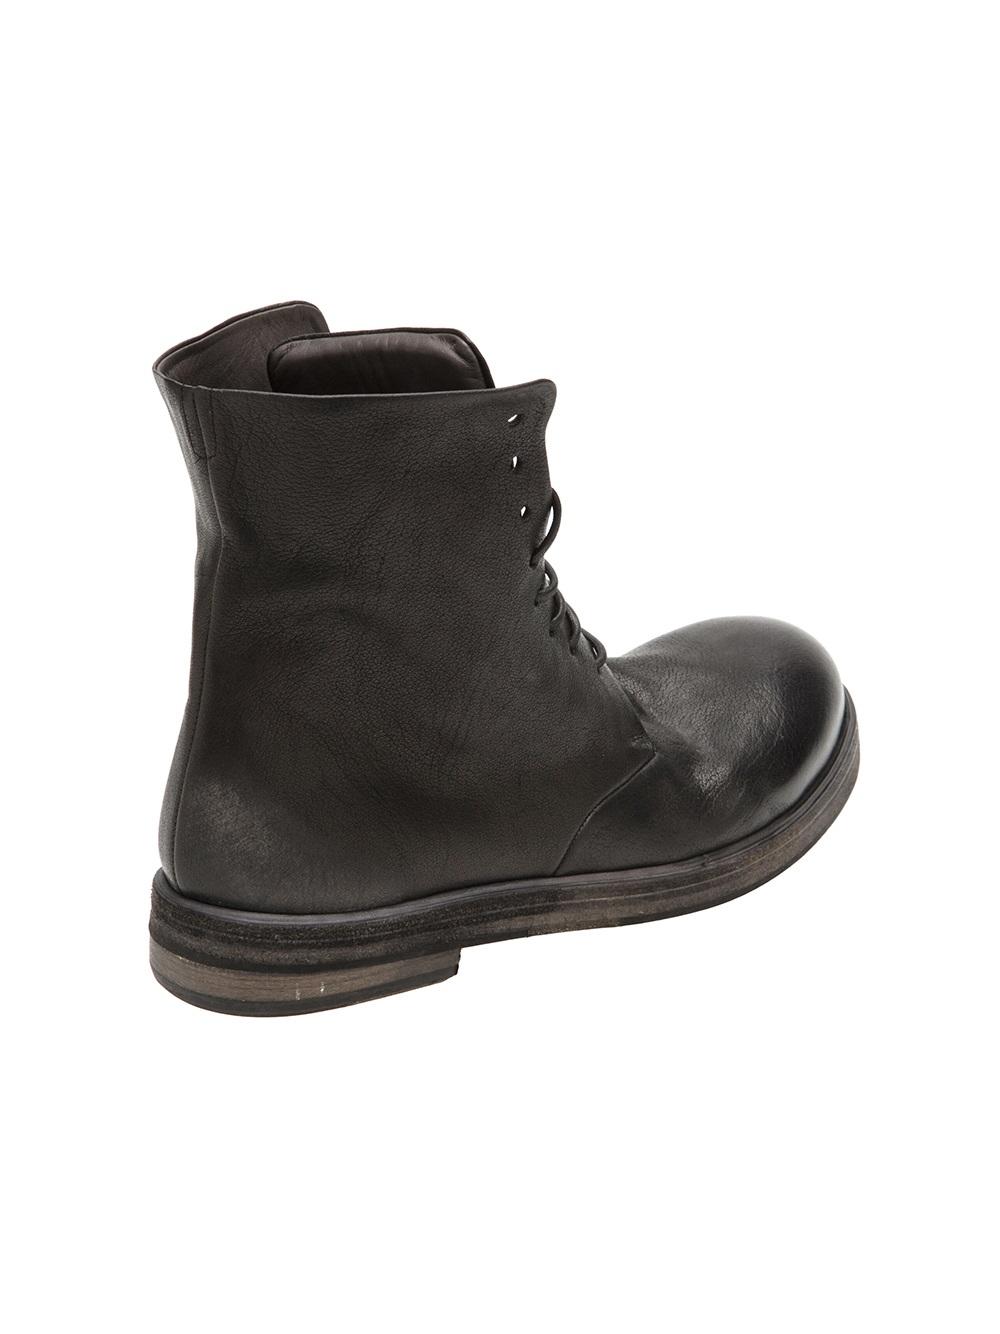 Maison Margiela Grey Zucca Zeppa Boots fmErc7a